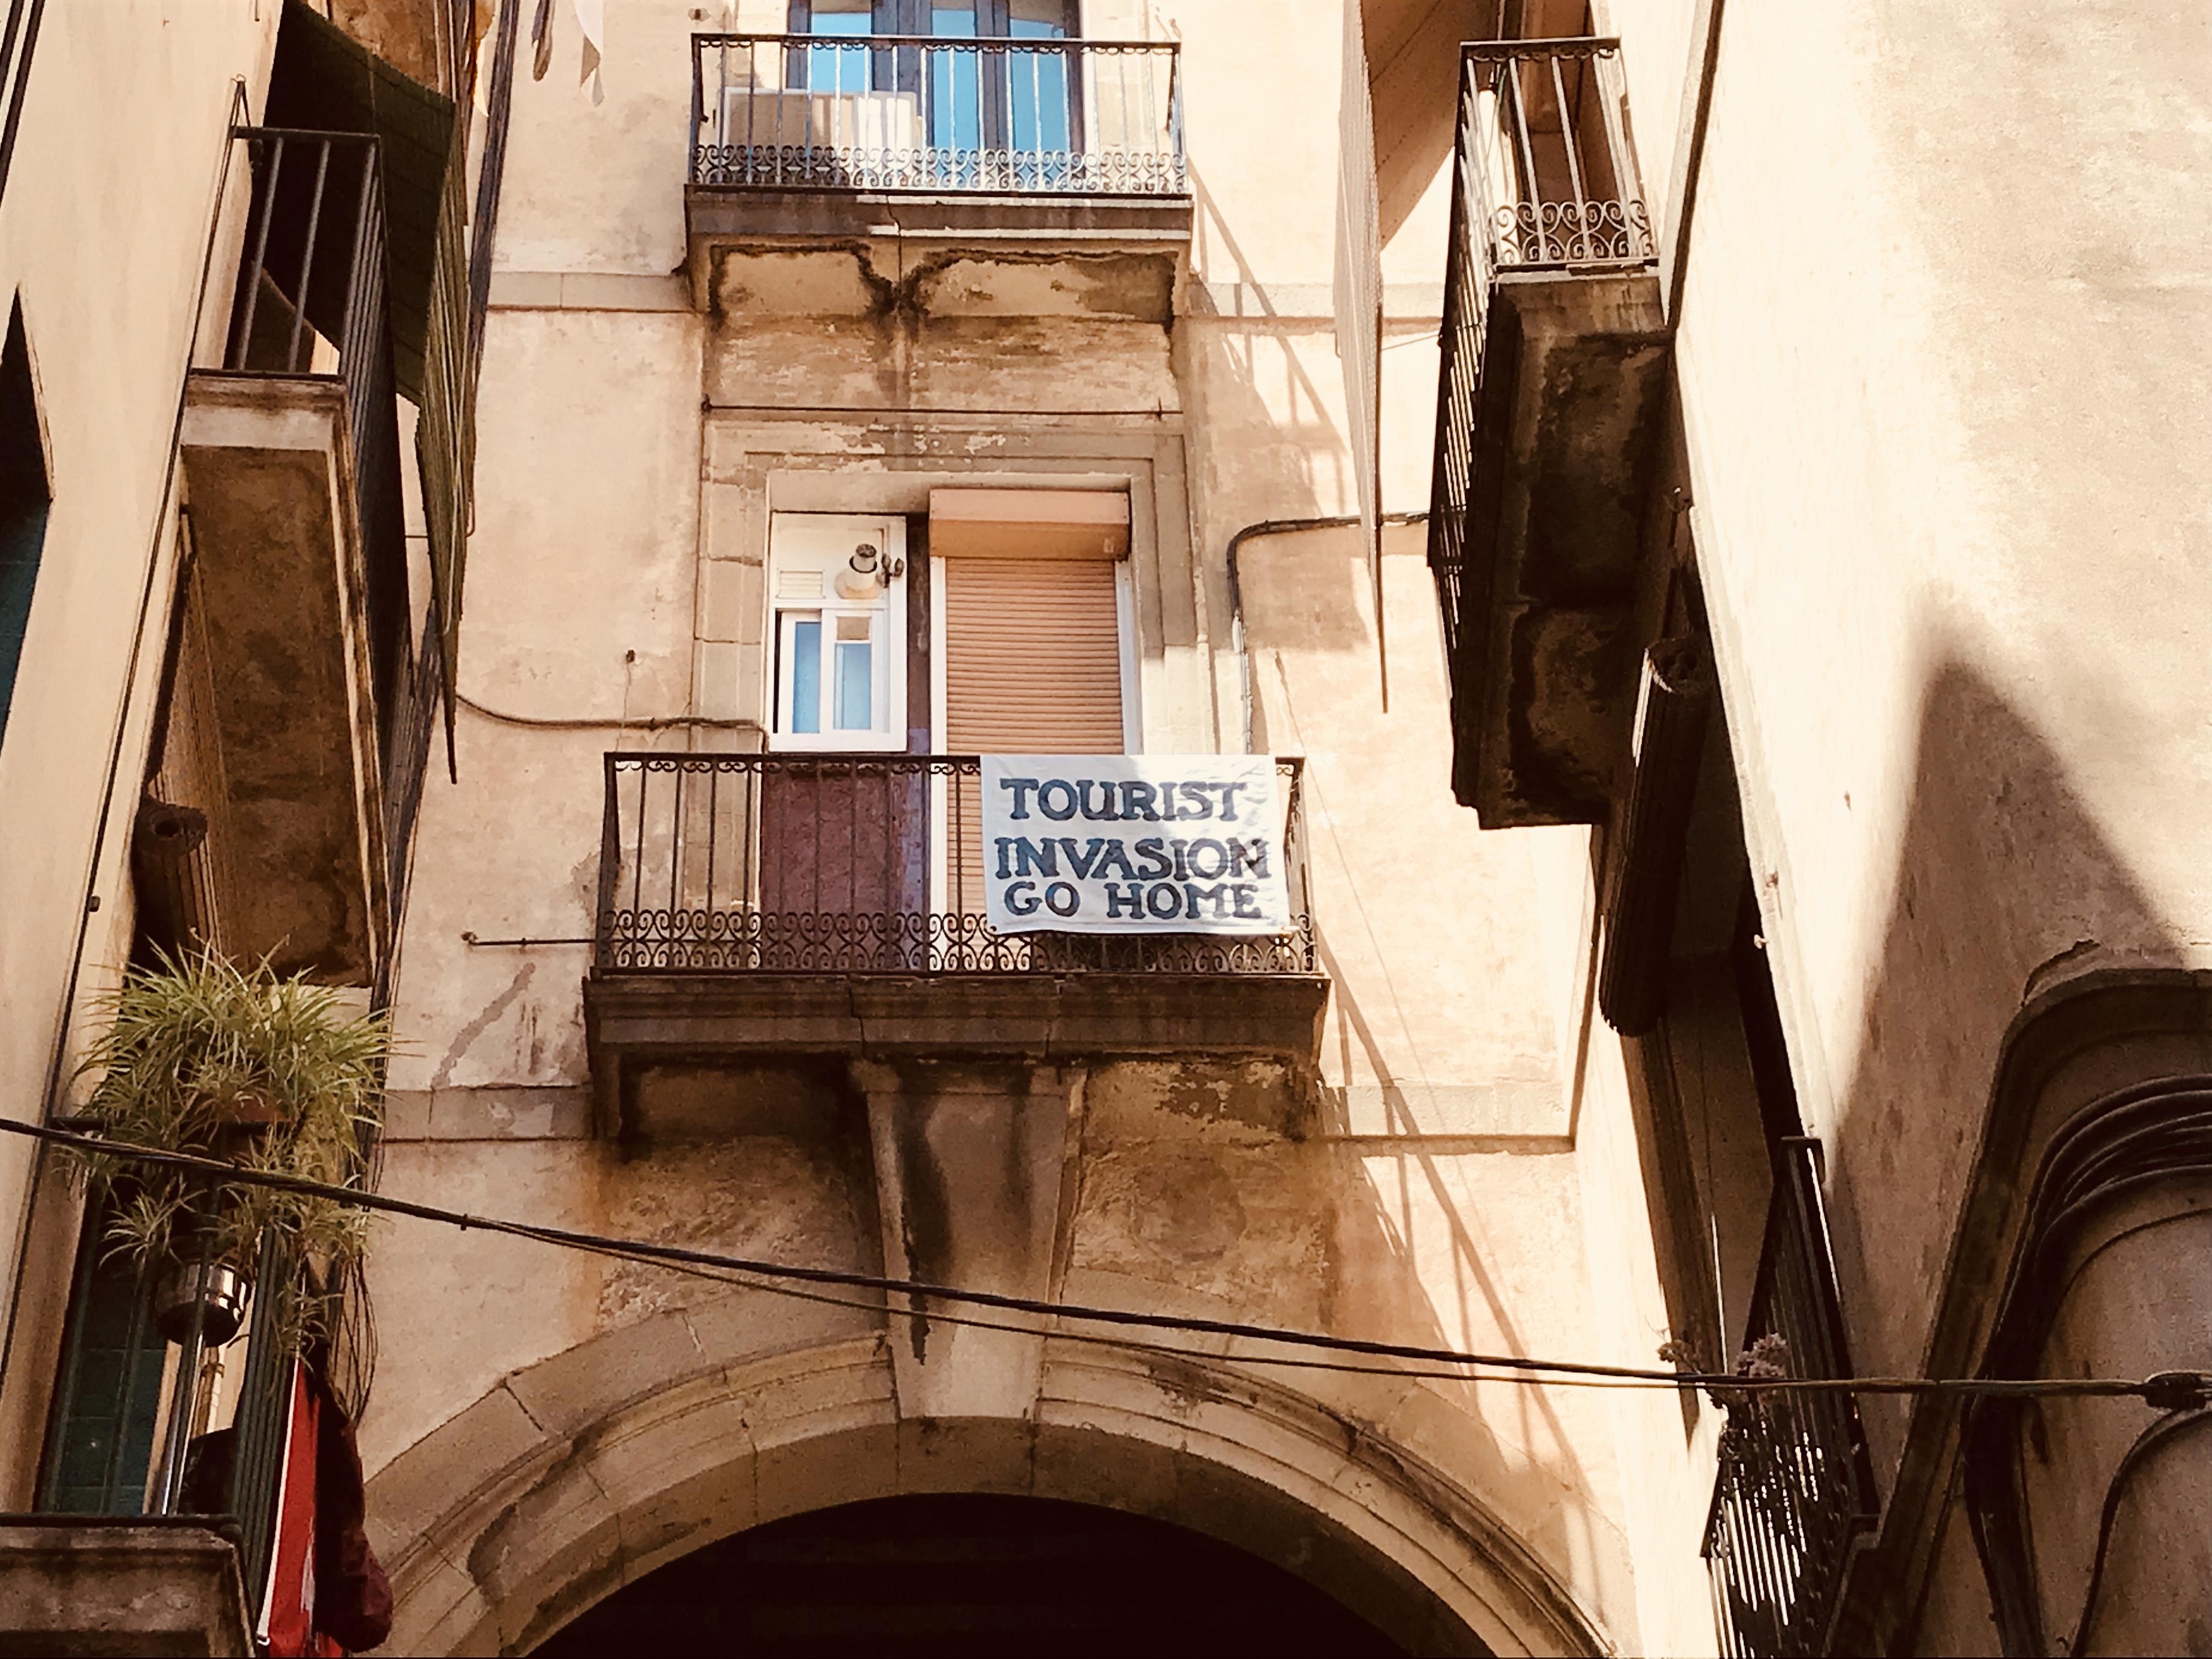 https://journalmetro.com/wp-content/uploads/2018/08/monde-tourists-go-home-touriste-barcelone.jpg?fit=4032%2C3024